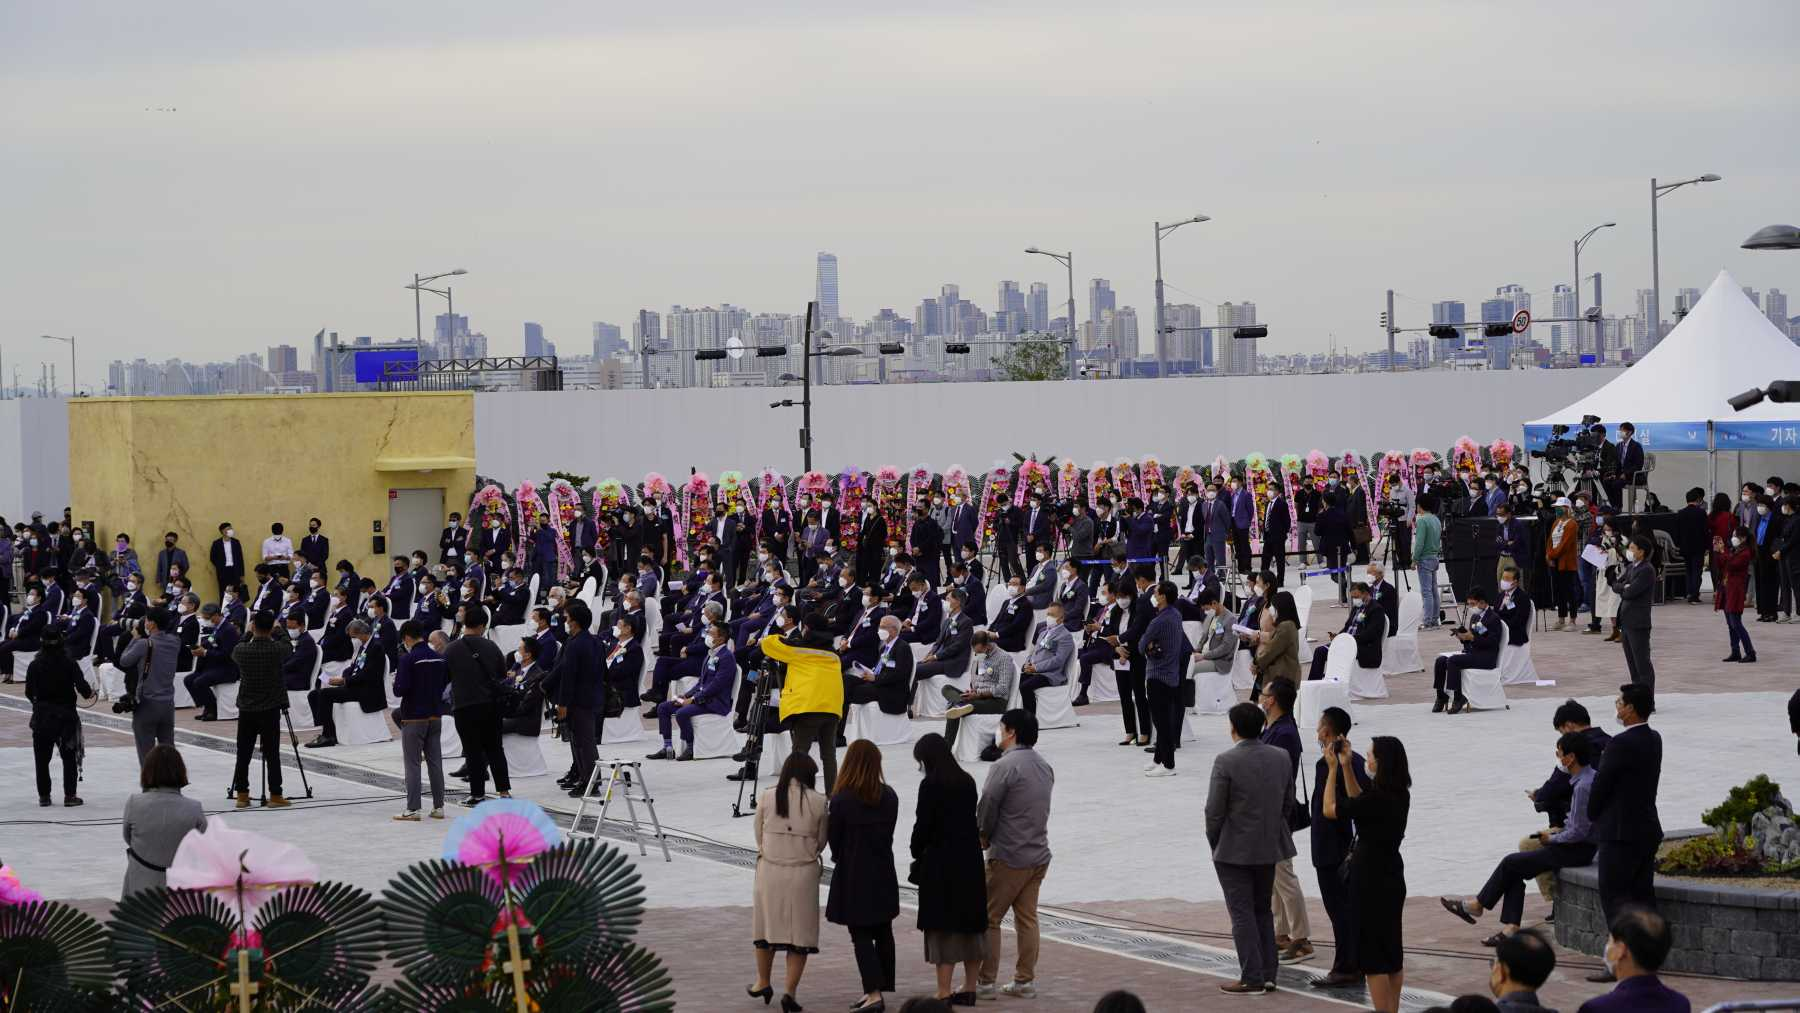 surf30 wavegarden cove corea Wave Park Opening Ceremony 2